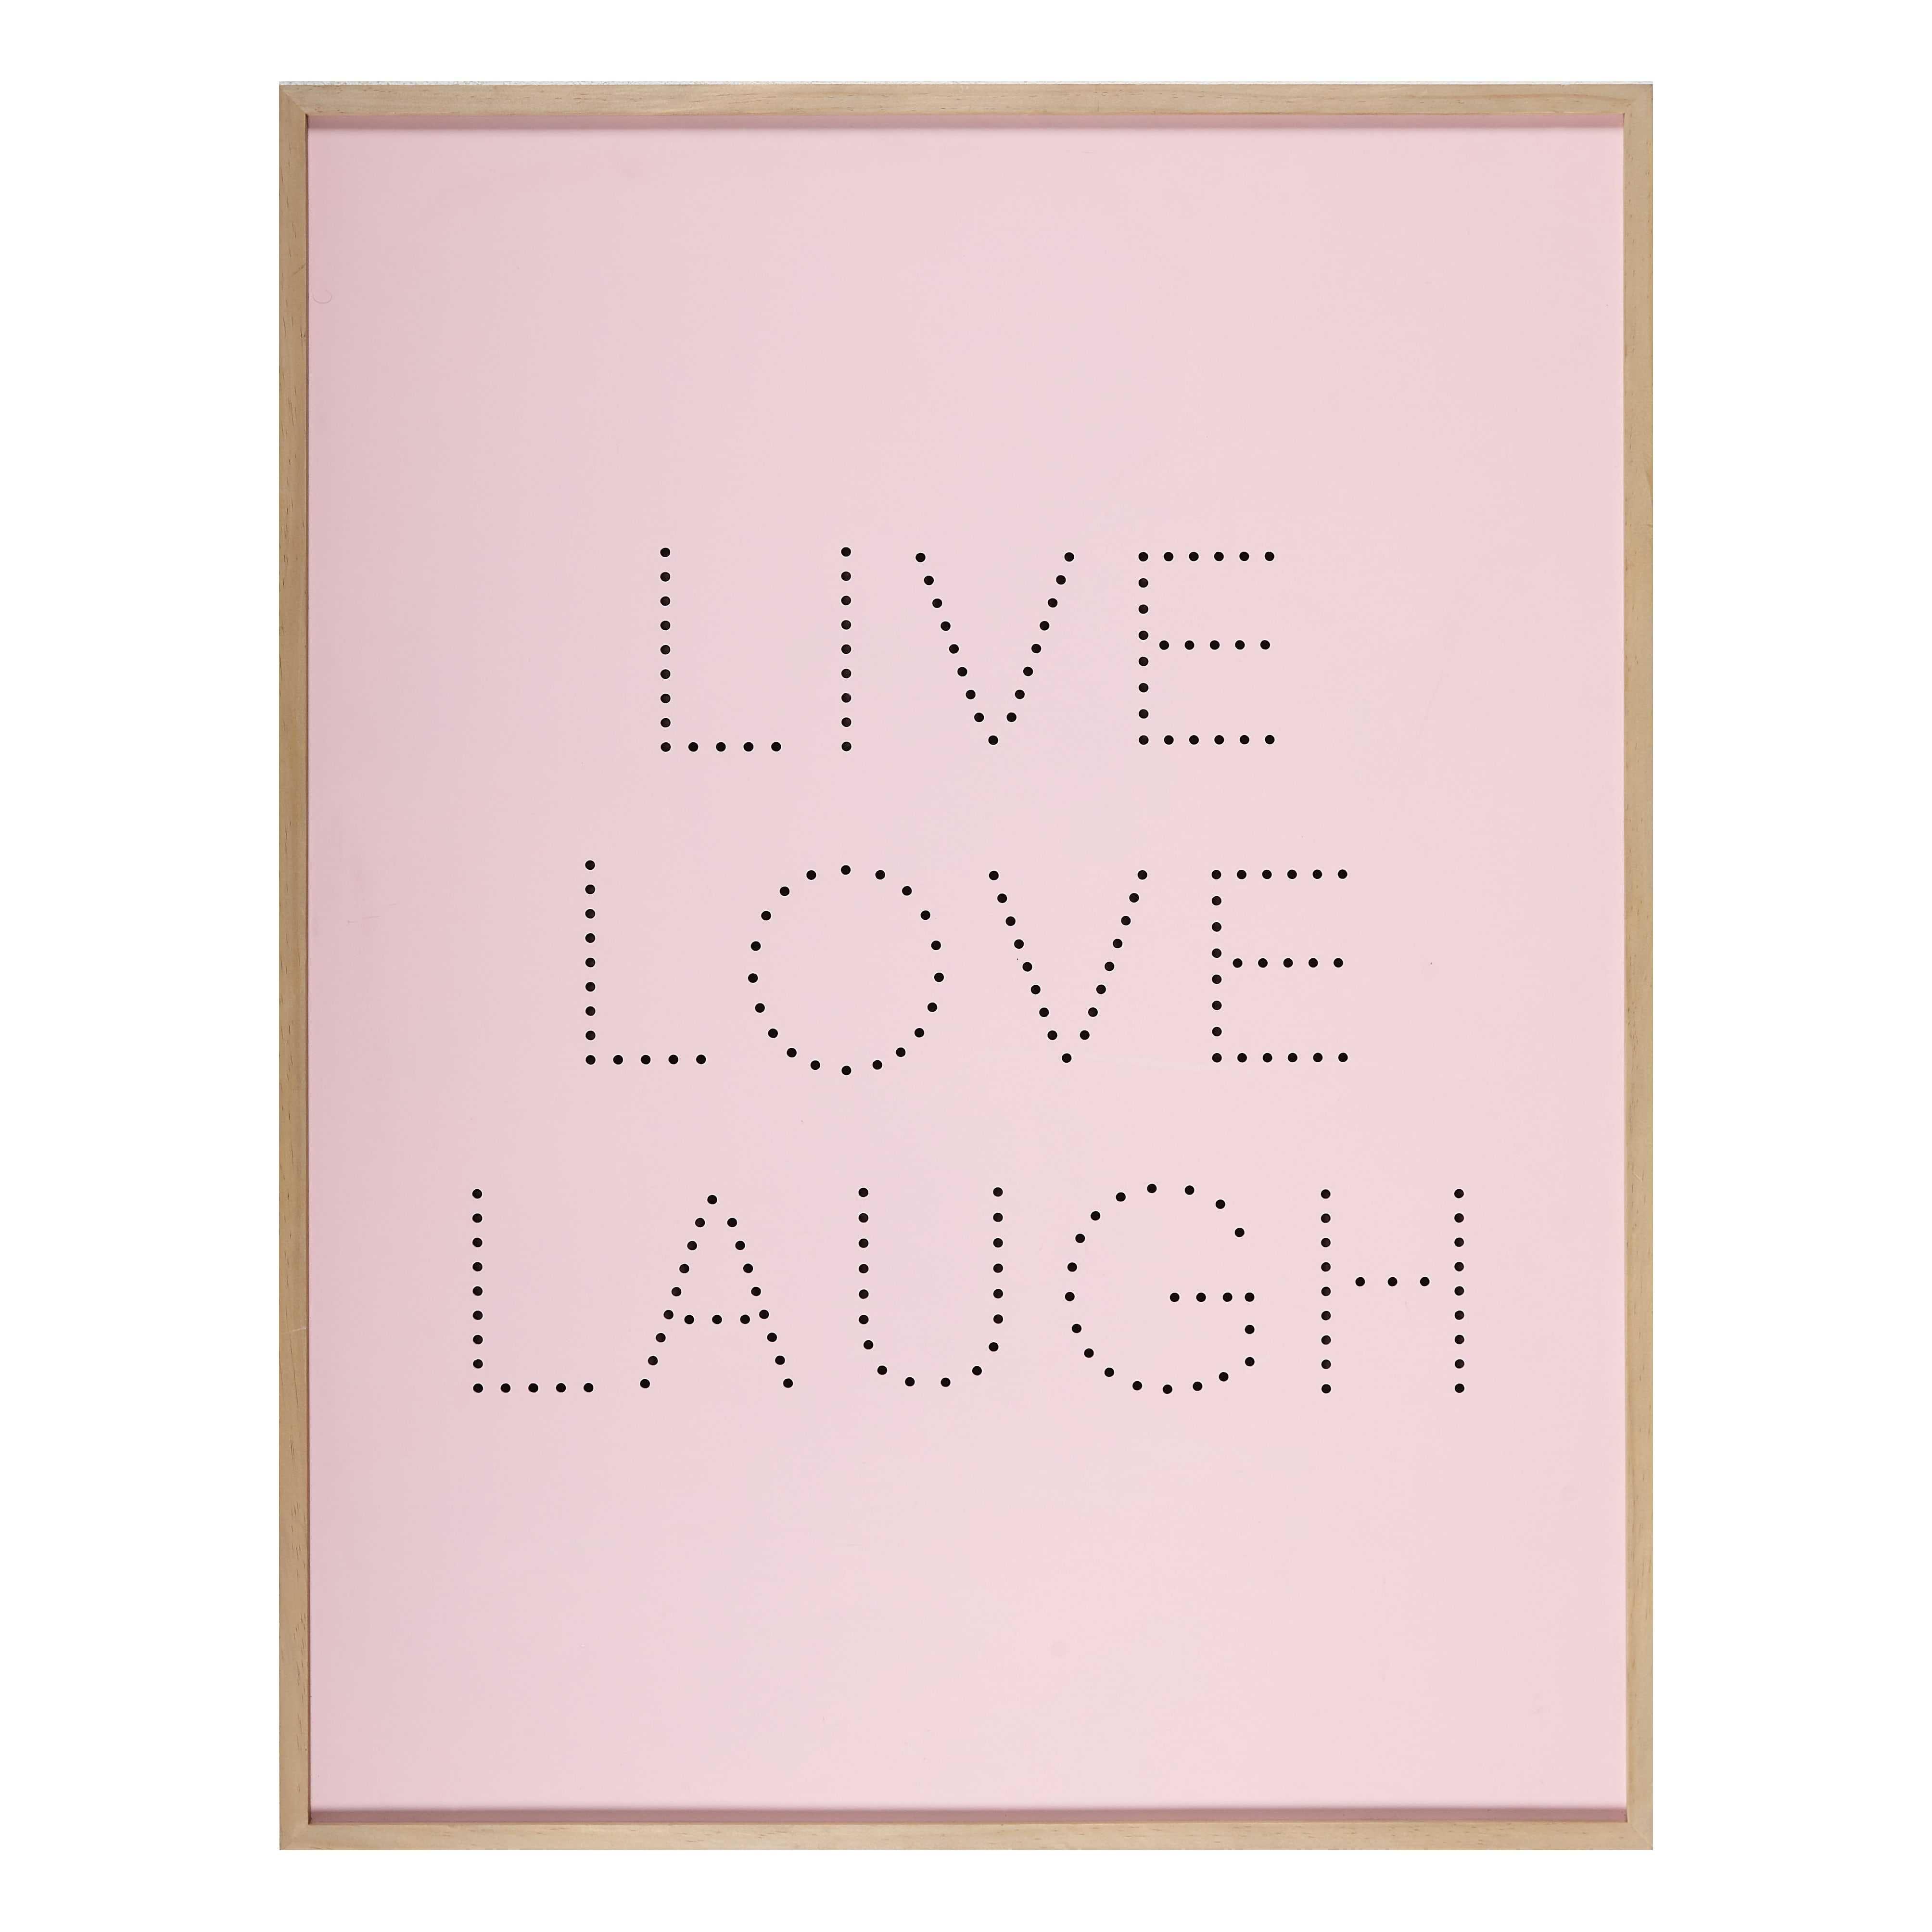 Cadre lumineux rose 70x90cm HAPPY SPIRIT   Ma chambre cosy parfaite ...